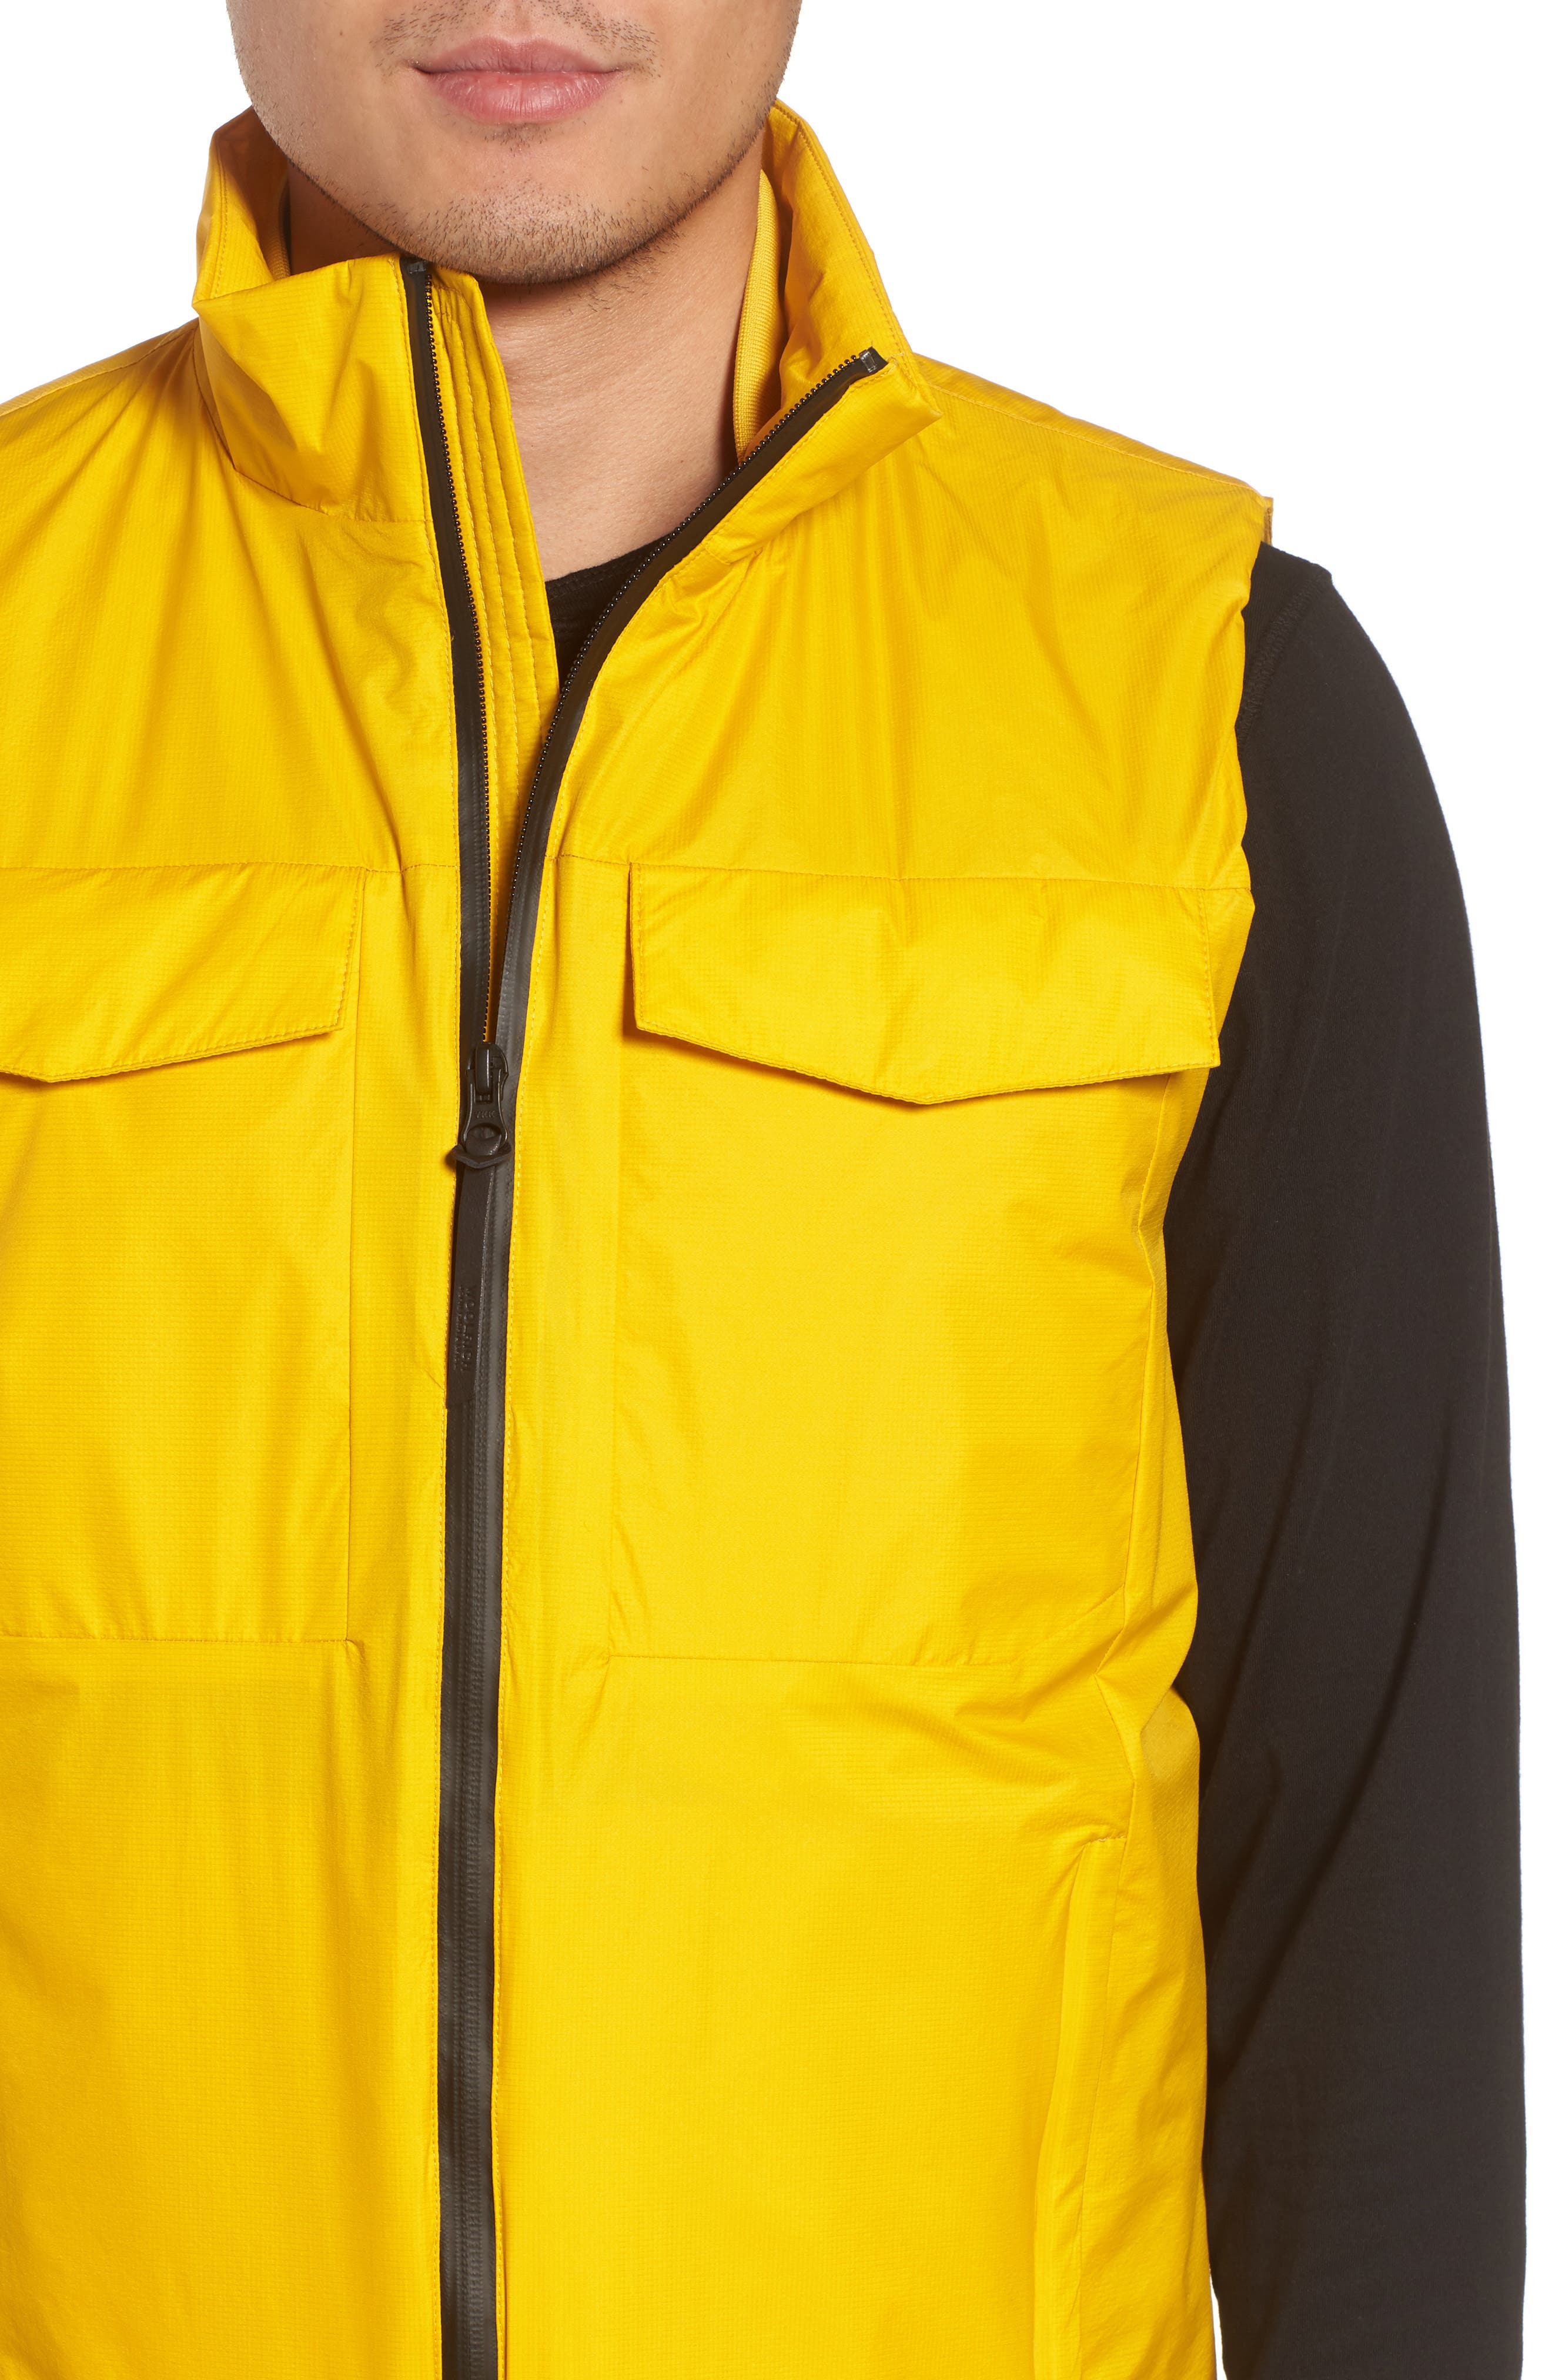 & Bros. Bering Vest,                             Alternate thumbnail 4, color,                             700